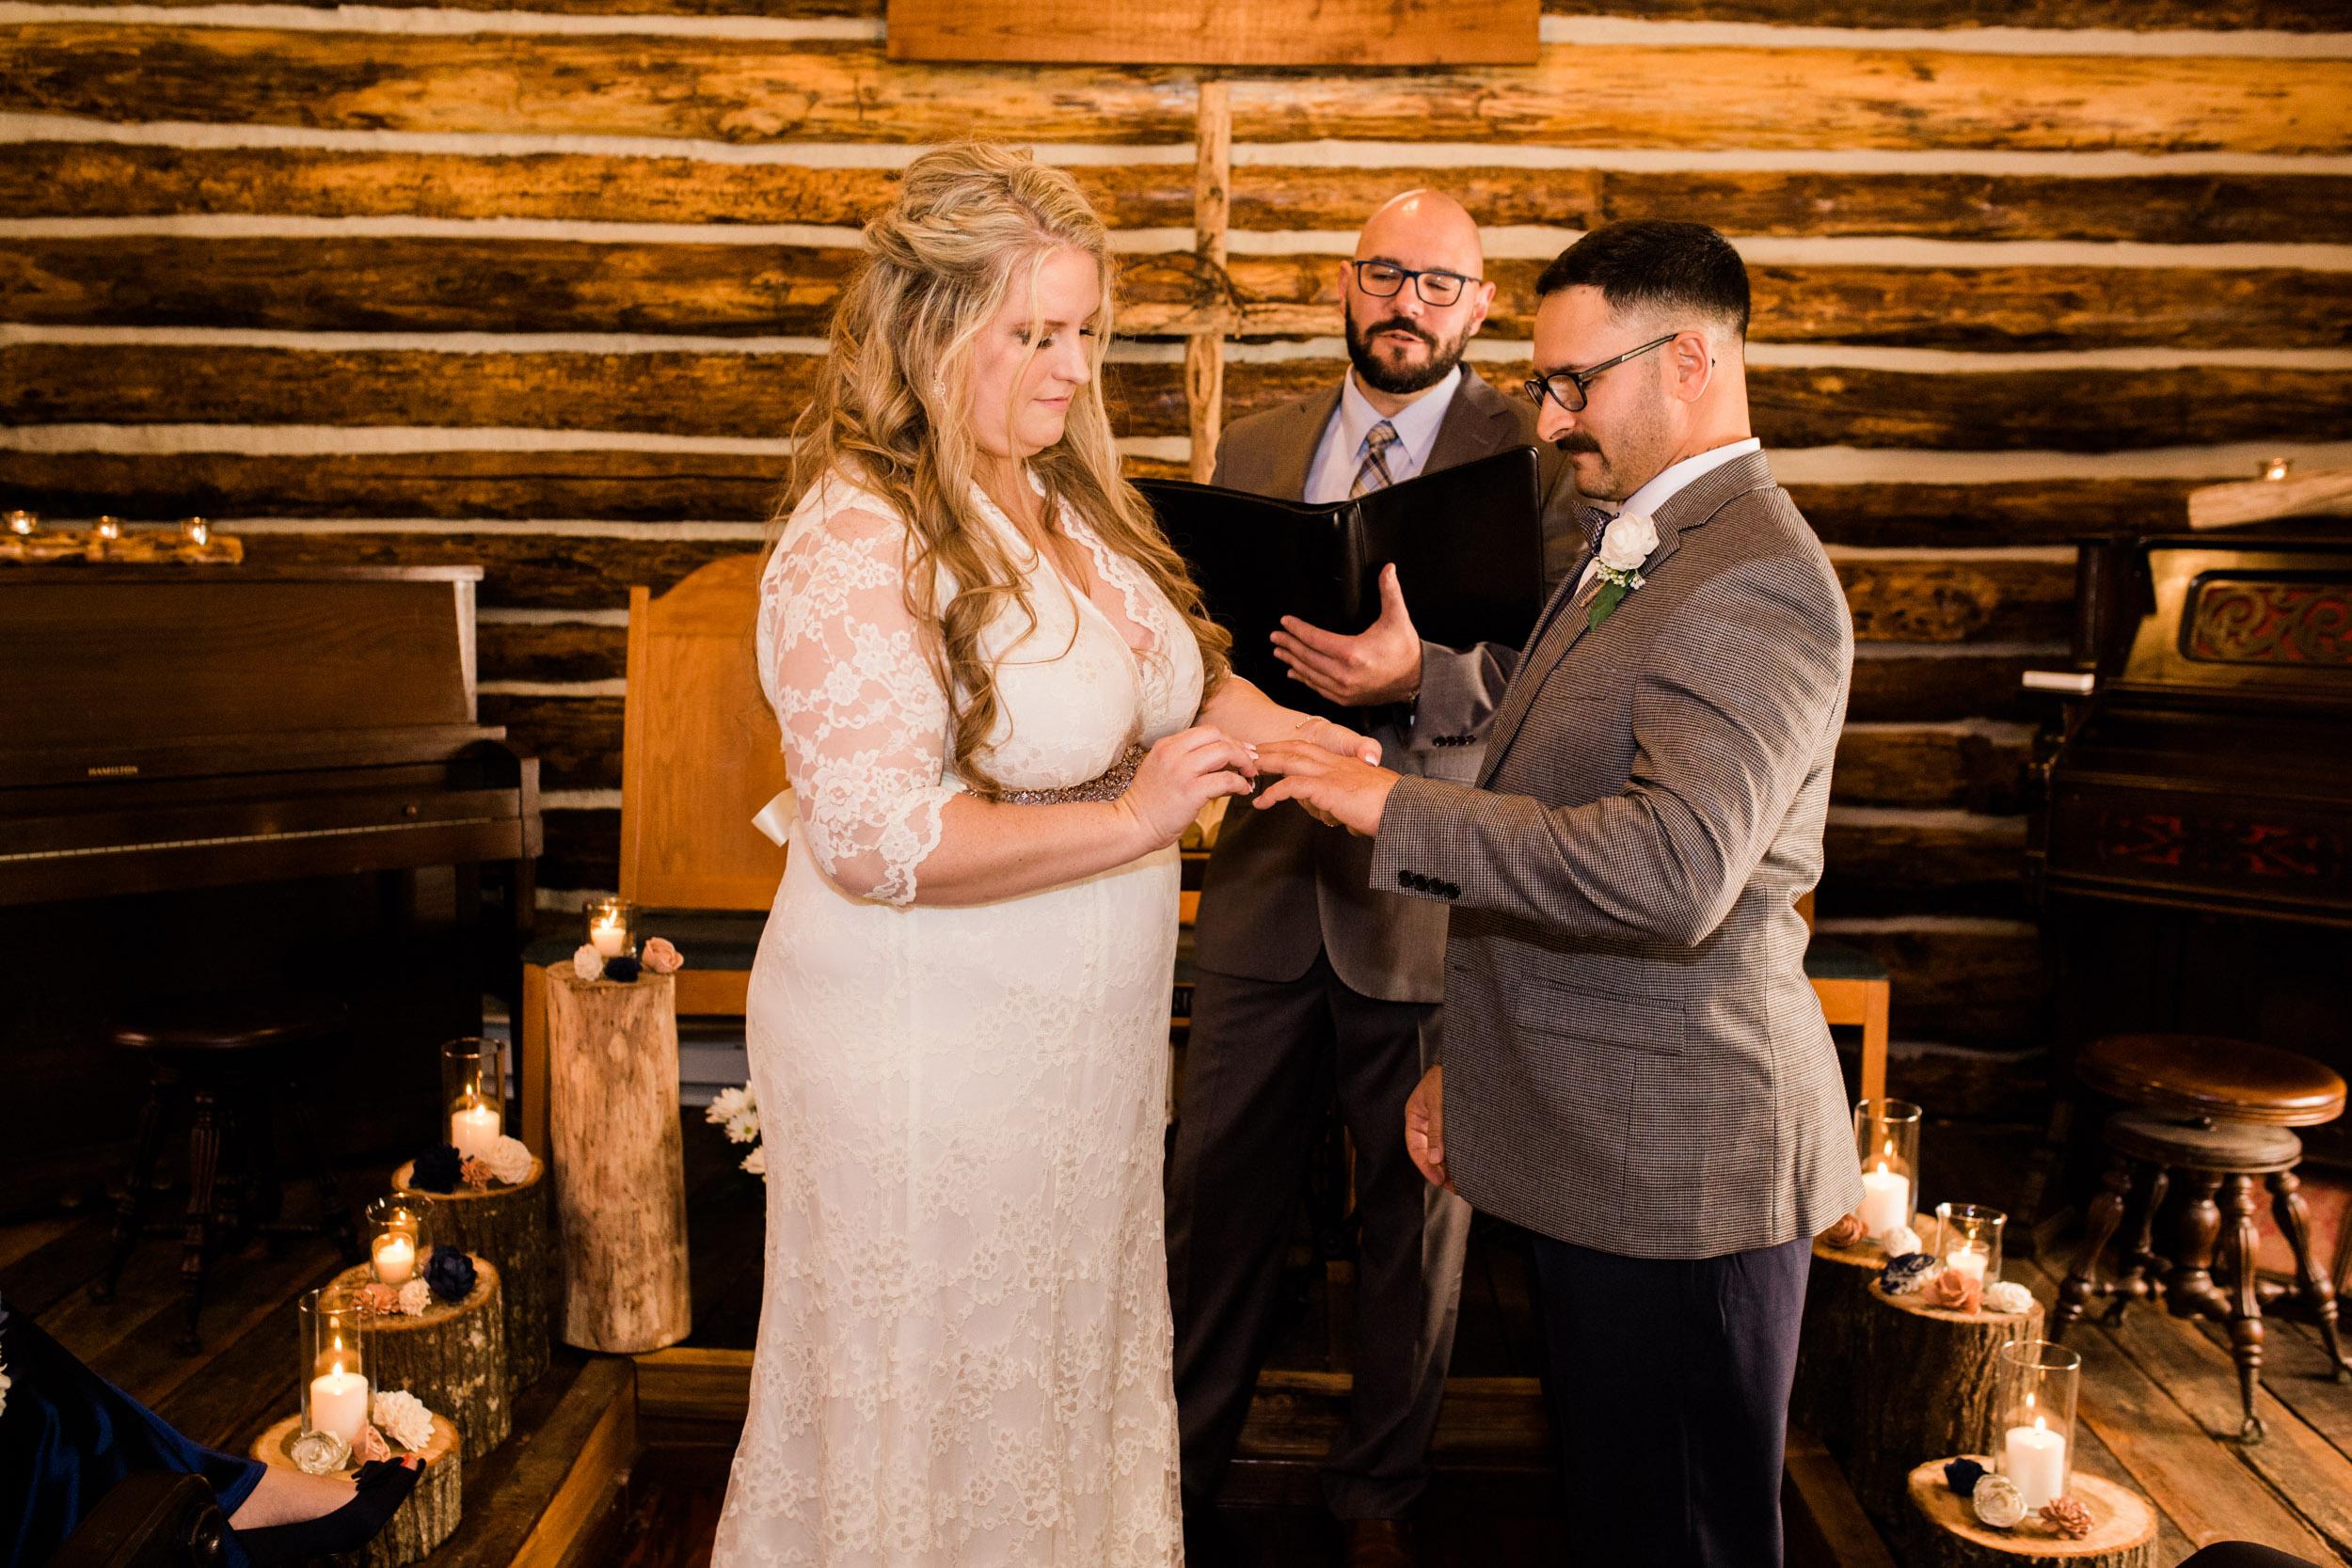 stephanie wedding photos (1 of 1)-31.jpg